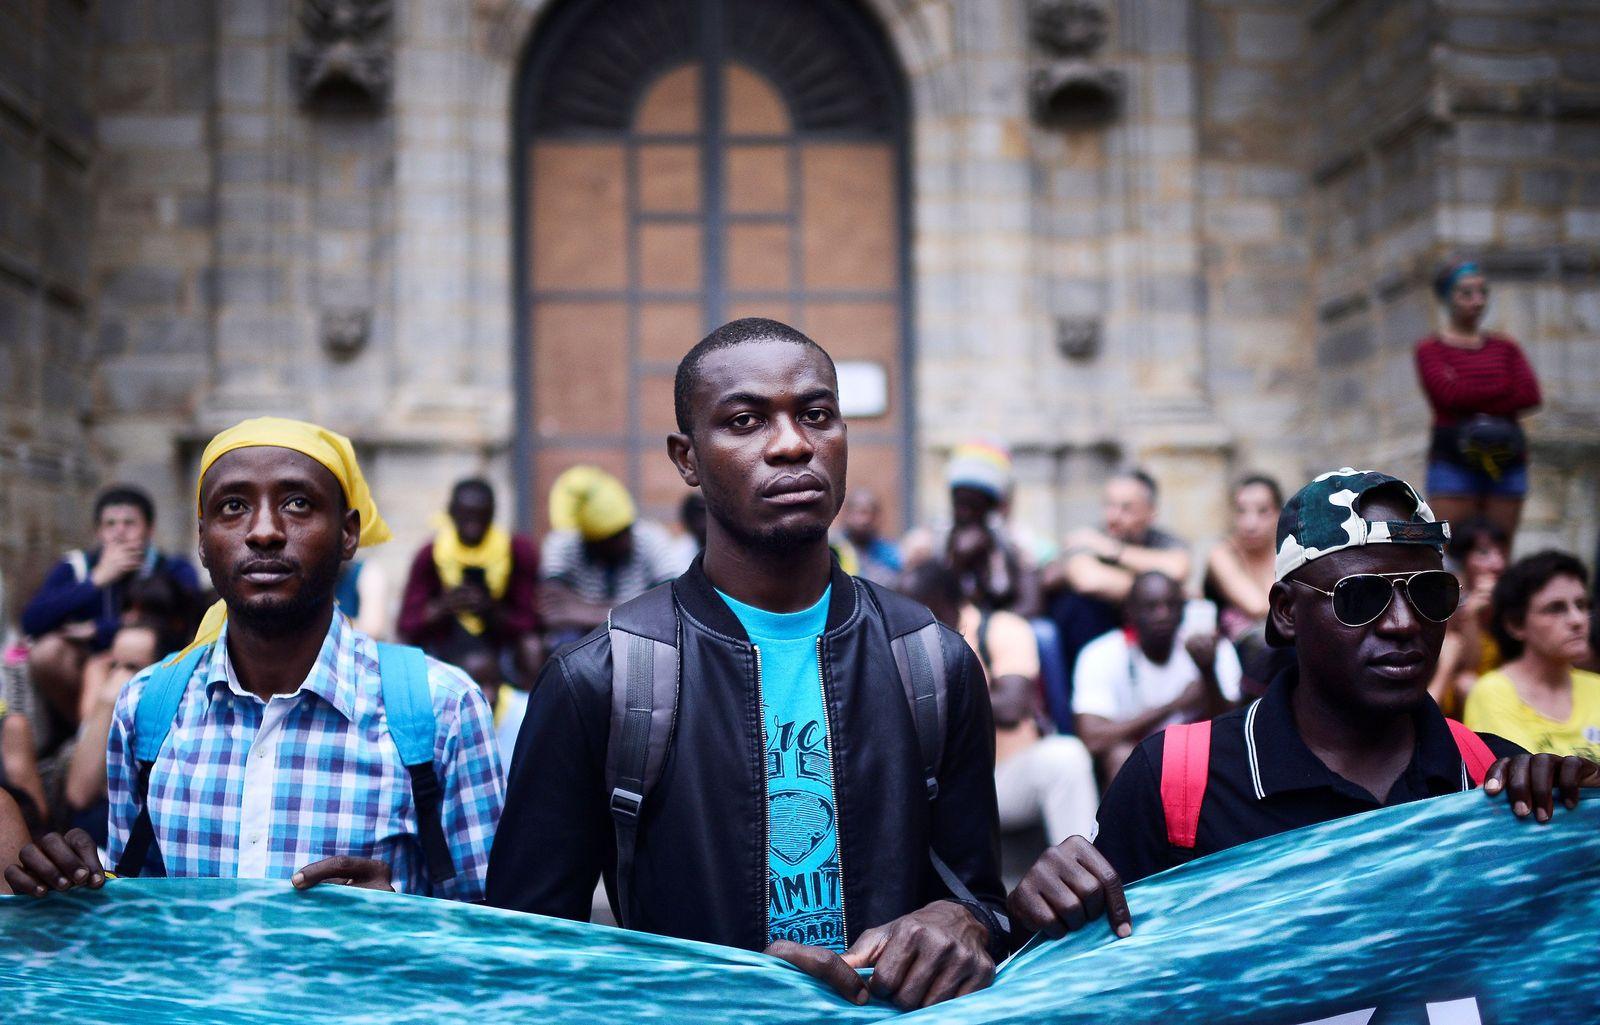 Spanien/ Flüchtlinge/ Bilbao